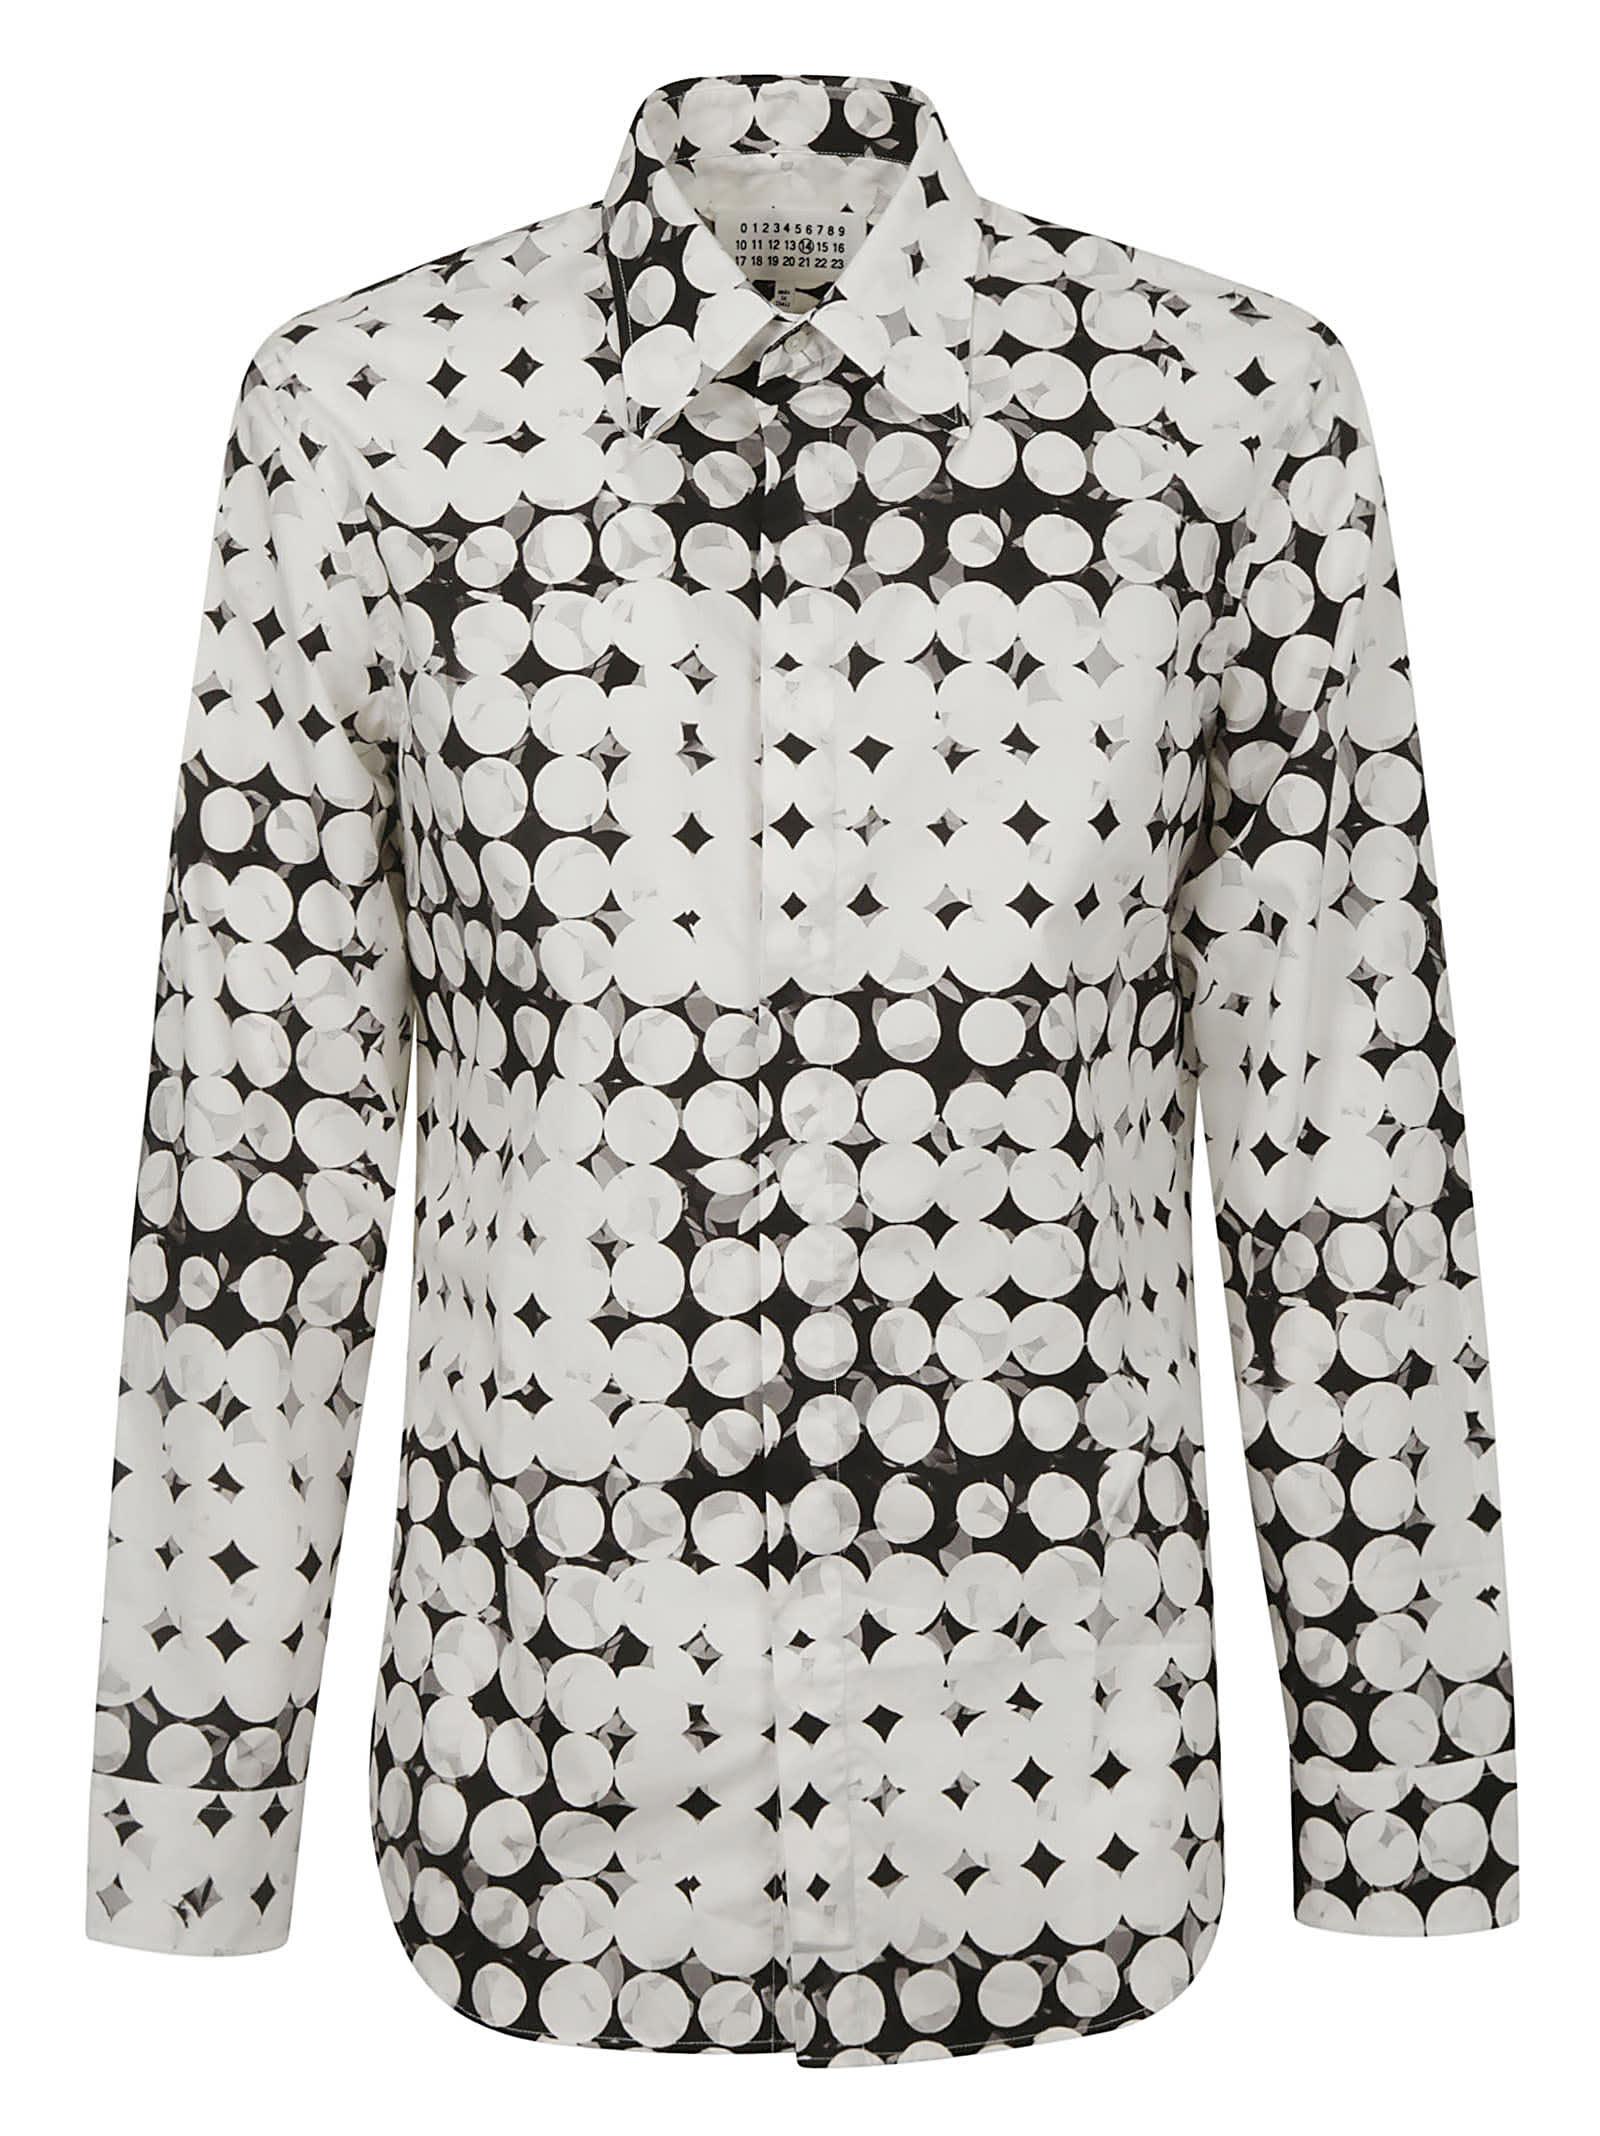 Maison Margiela All-over Printed Shirt